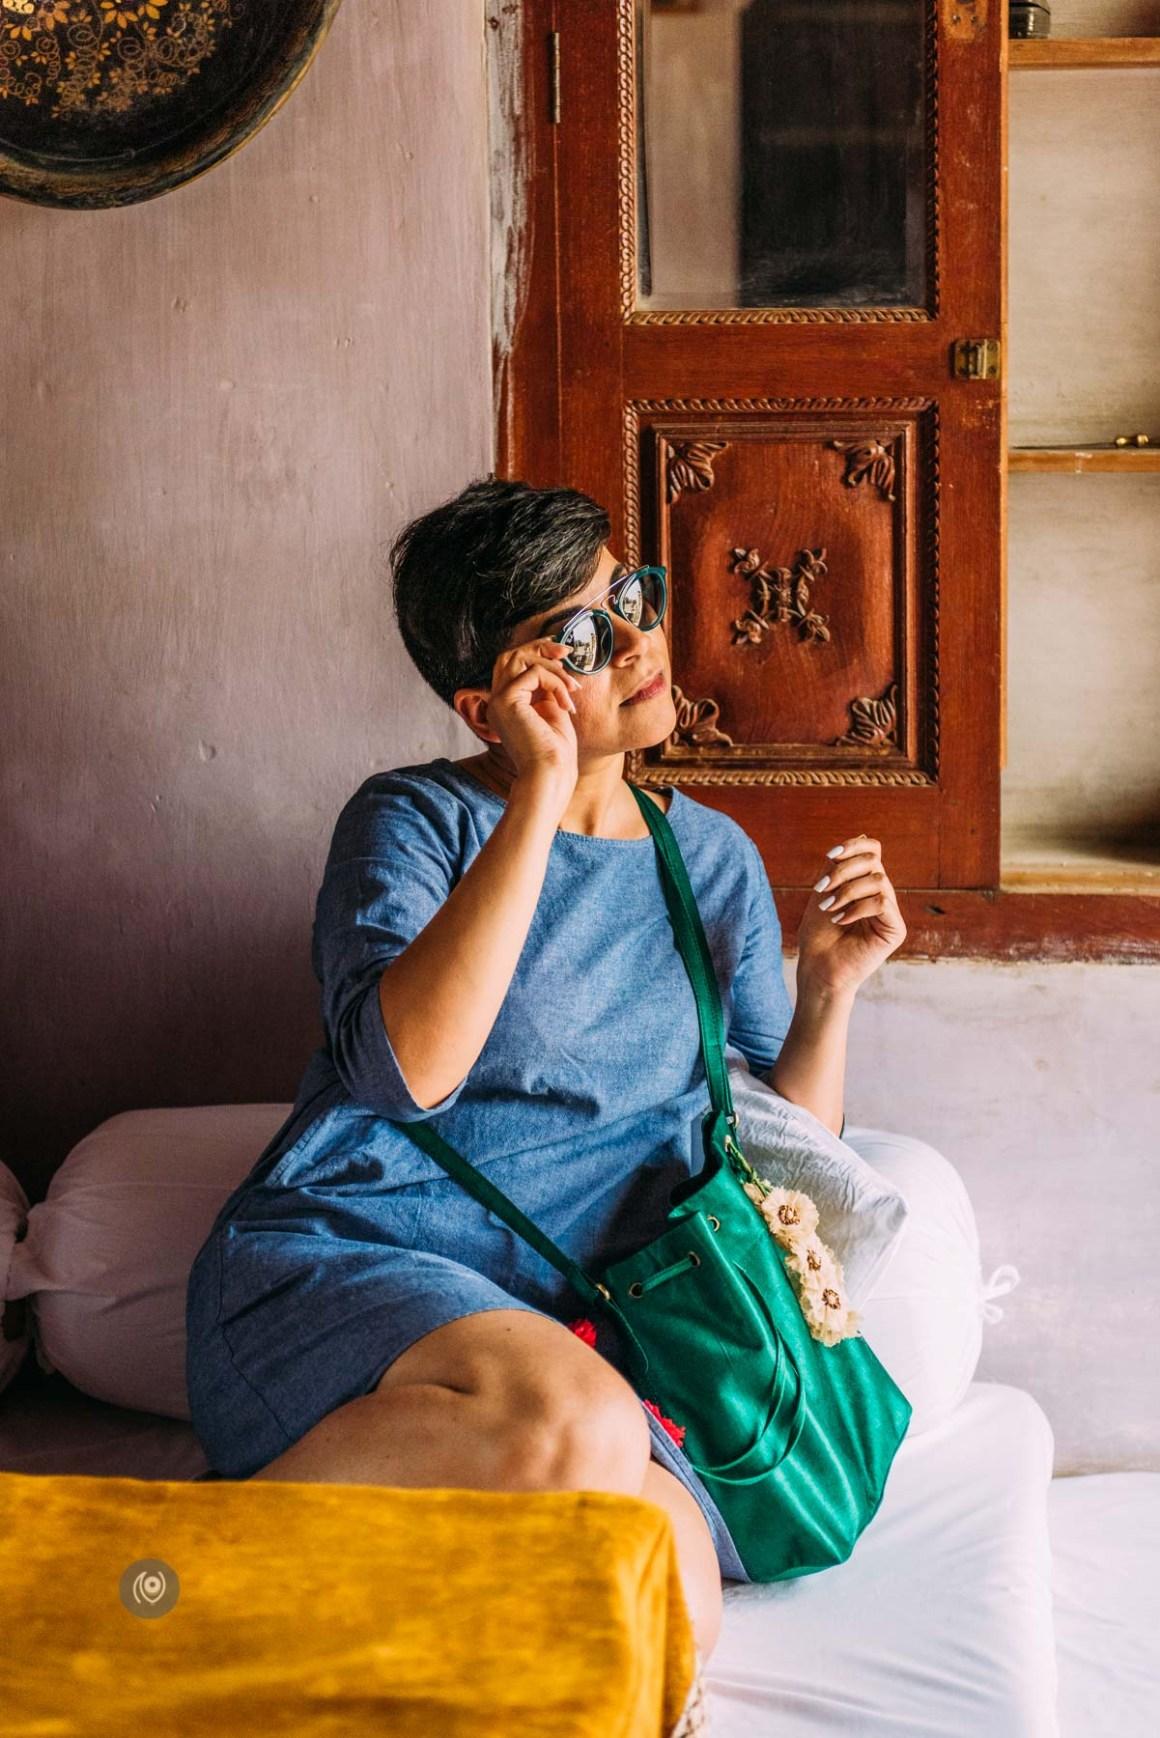 Experience Collector, Lifestyle, Lifestyle Blogger, Lifestyle Blogger India, Lifestyle Photographer India, Luxury Blogger, Luxury Blogger India, Luxury Brands, Luxury Photographer, Luxury Photographer India, Naina Redhu, Naina.co, Professional Photographer, Visual Storyteller, Visual Storyteller for Luxury Brands, Influencer, Luxury Influencer, Lifestyle Influencer, Photography Influencer, Brand Storyteller, Visual Storyteller, India, #EyesForIndia, #EyesForRajasthan, Rajasthan, #EyesForDestinations, Travel, Travel Photographer, Travel Blogger, #EyesForDining, Hospitality, Hotel, Thar Desert, Tourism, Bikaner, Narendra Bhawan, Lunch, #EyesForDining, Rampuria Haveli, Merchants Trail, Heritage, Architecture